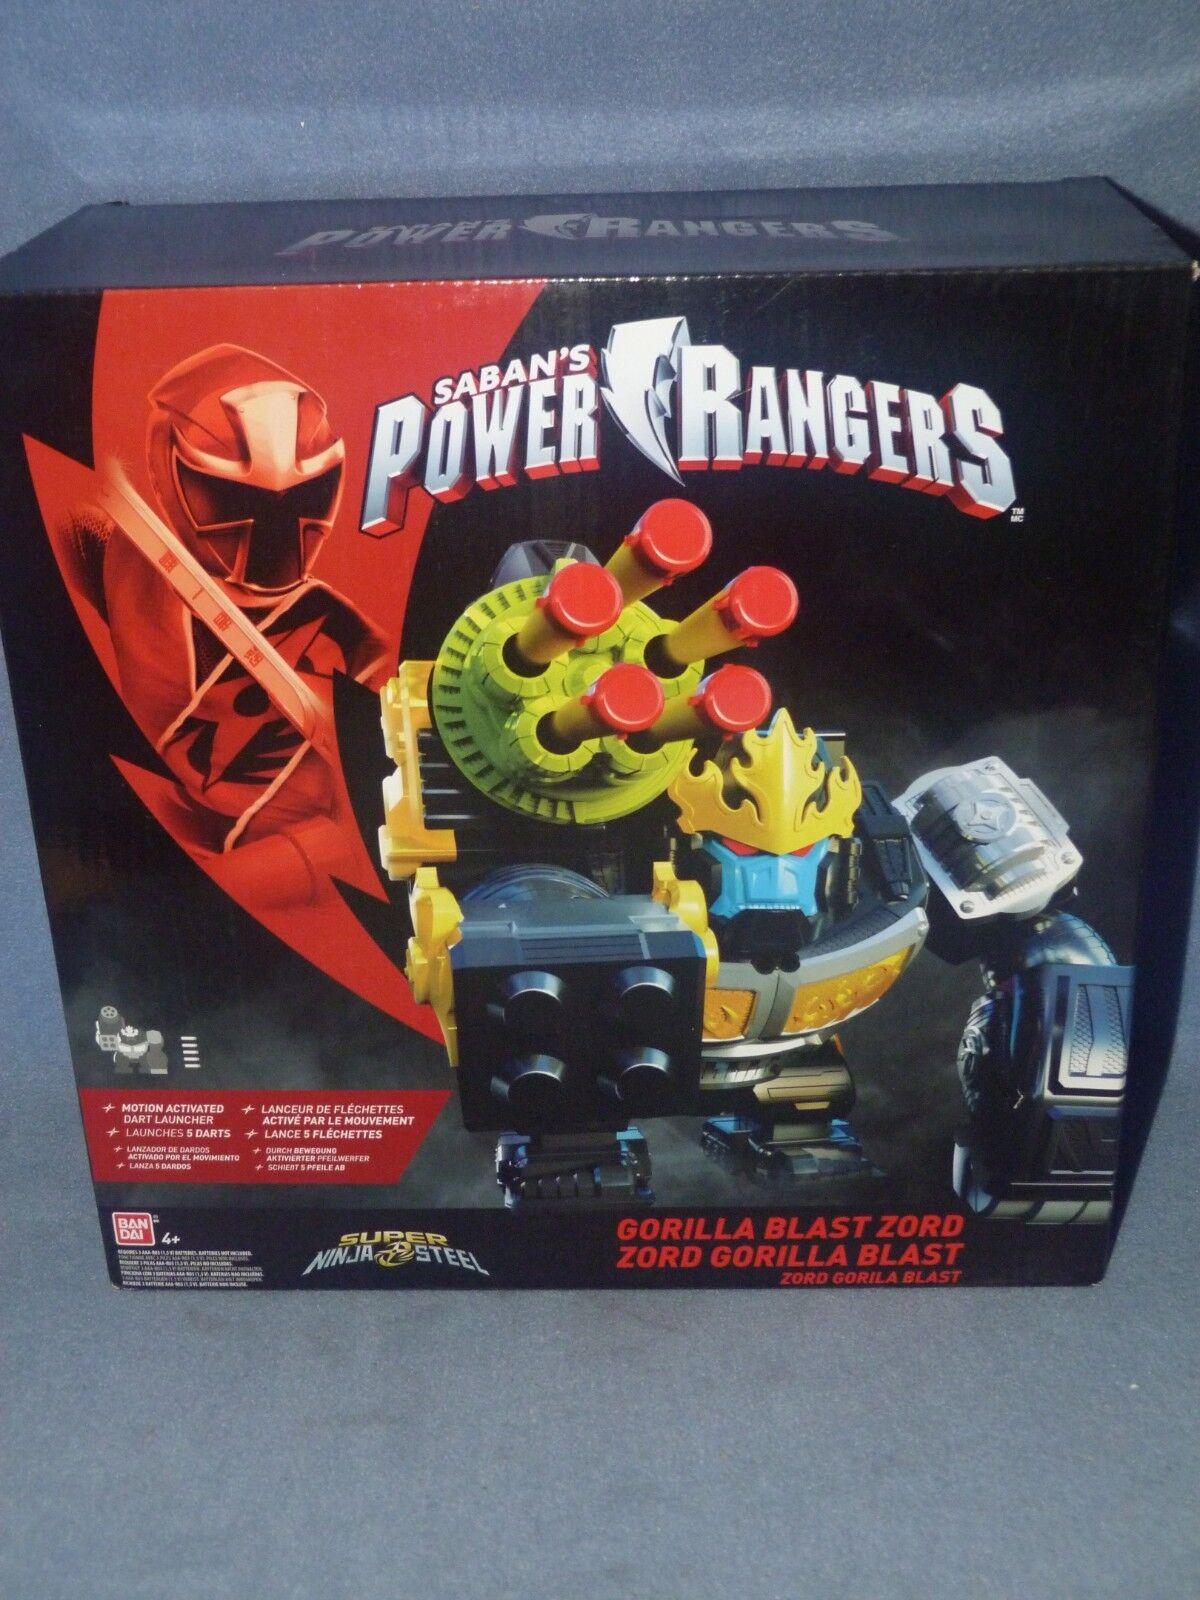 Power rangers super ninja stahl gorilla scharfschütze explosion zord - bnib